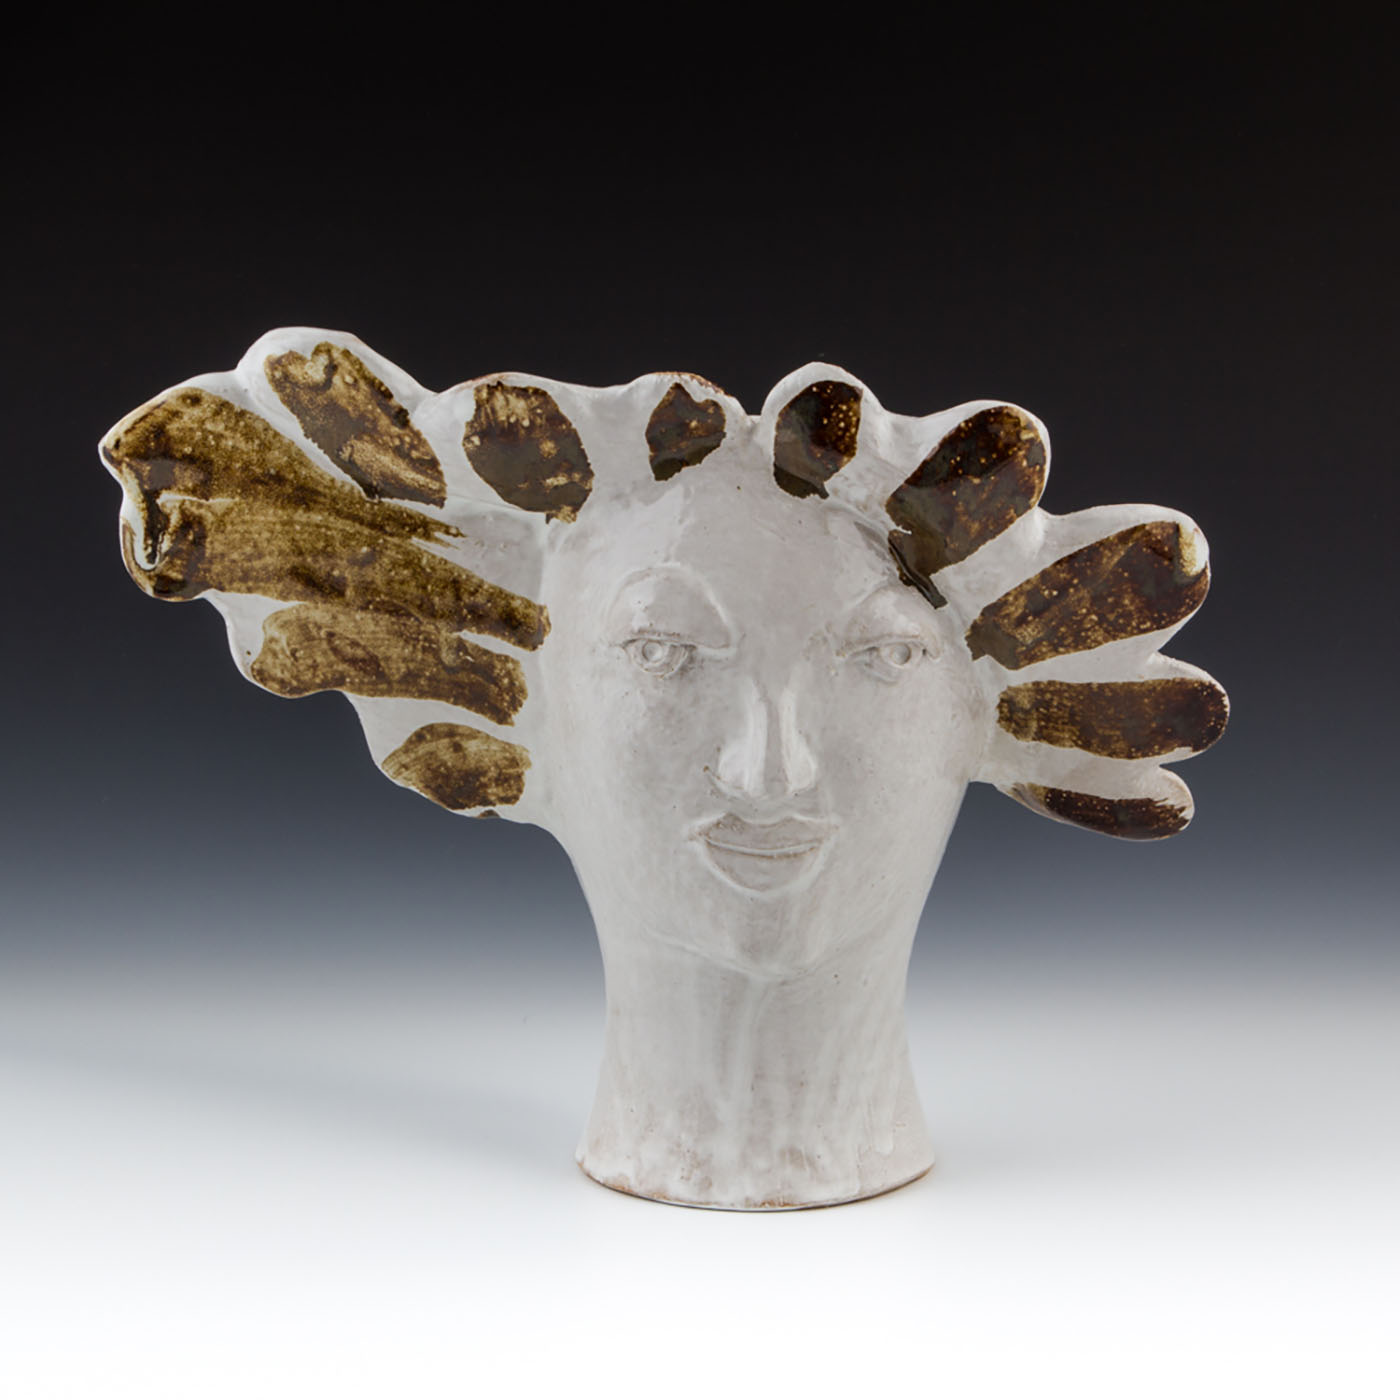 MELISSA MONROE 3D Functional: Ceramics image 4